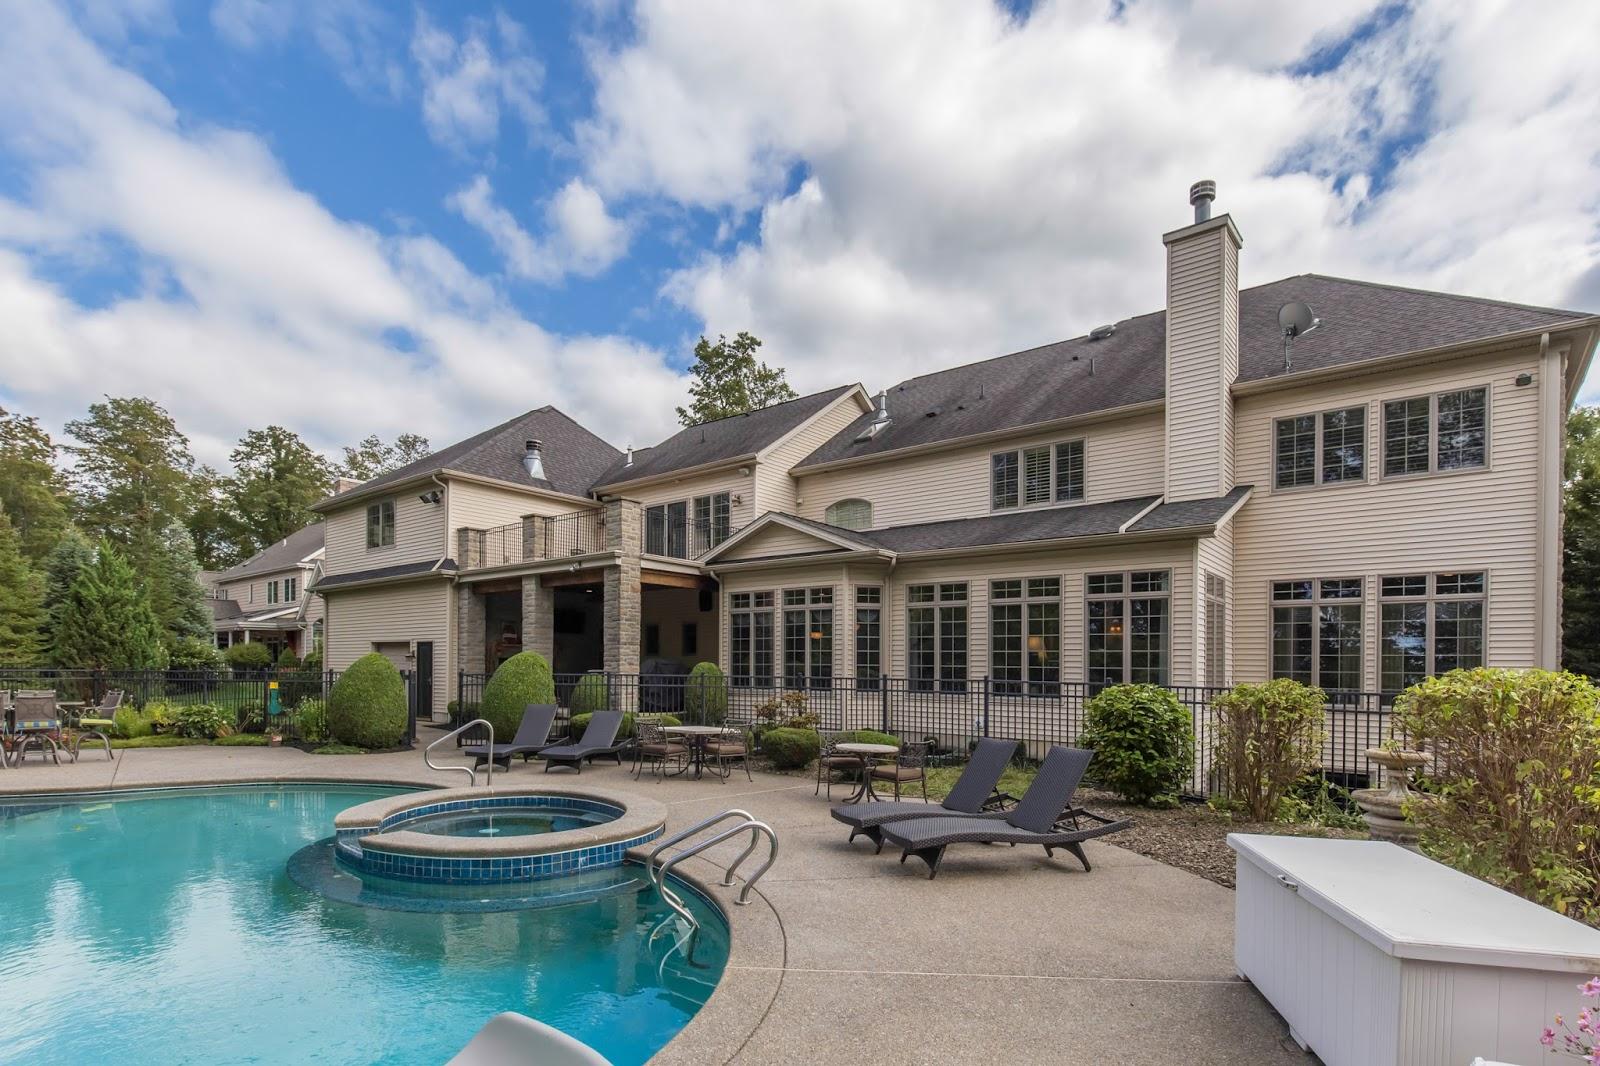 Real estate photographer Canton, Northville, Novi, Ann Arbor